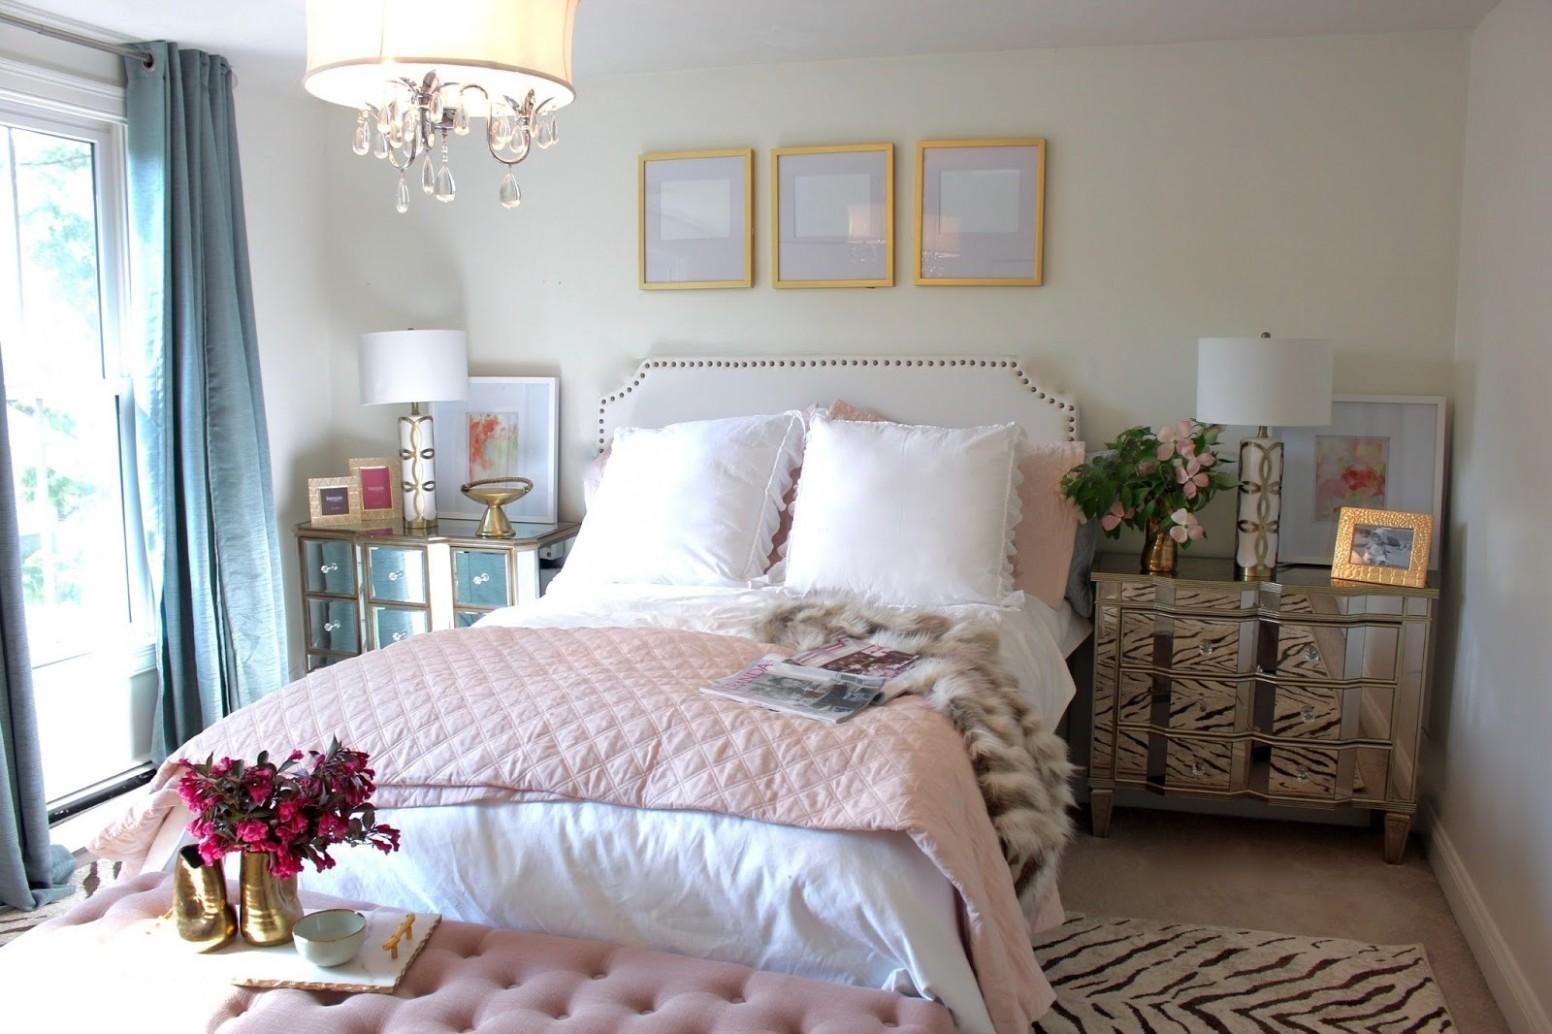 Feminine Bedrooms Decorating Bedroom Ideas Mature Woman – BAC-OJJ - Bedroom Ideas For Women